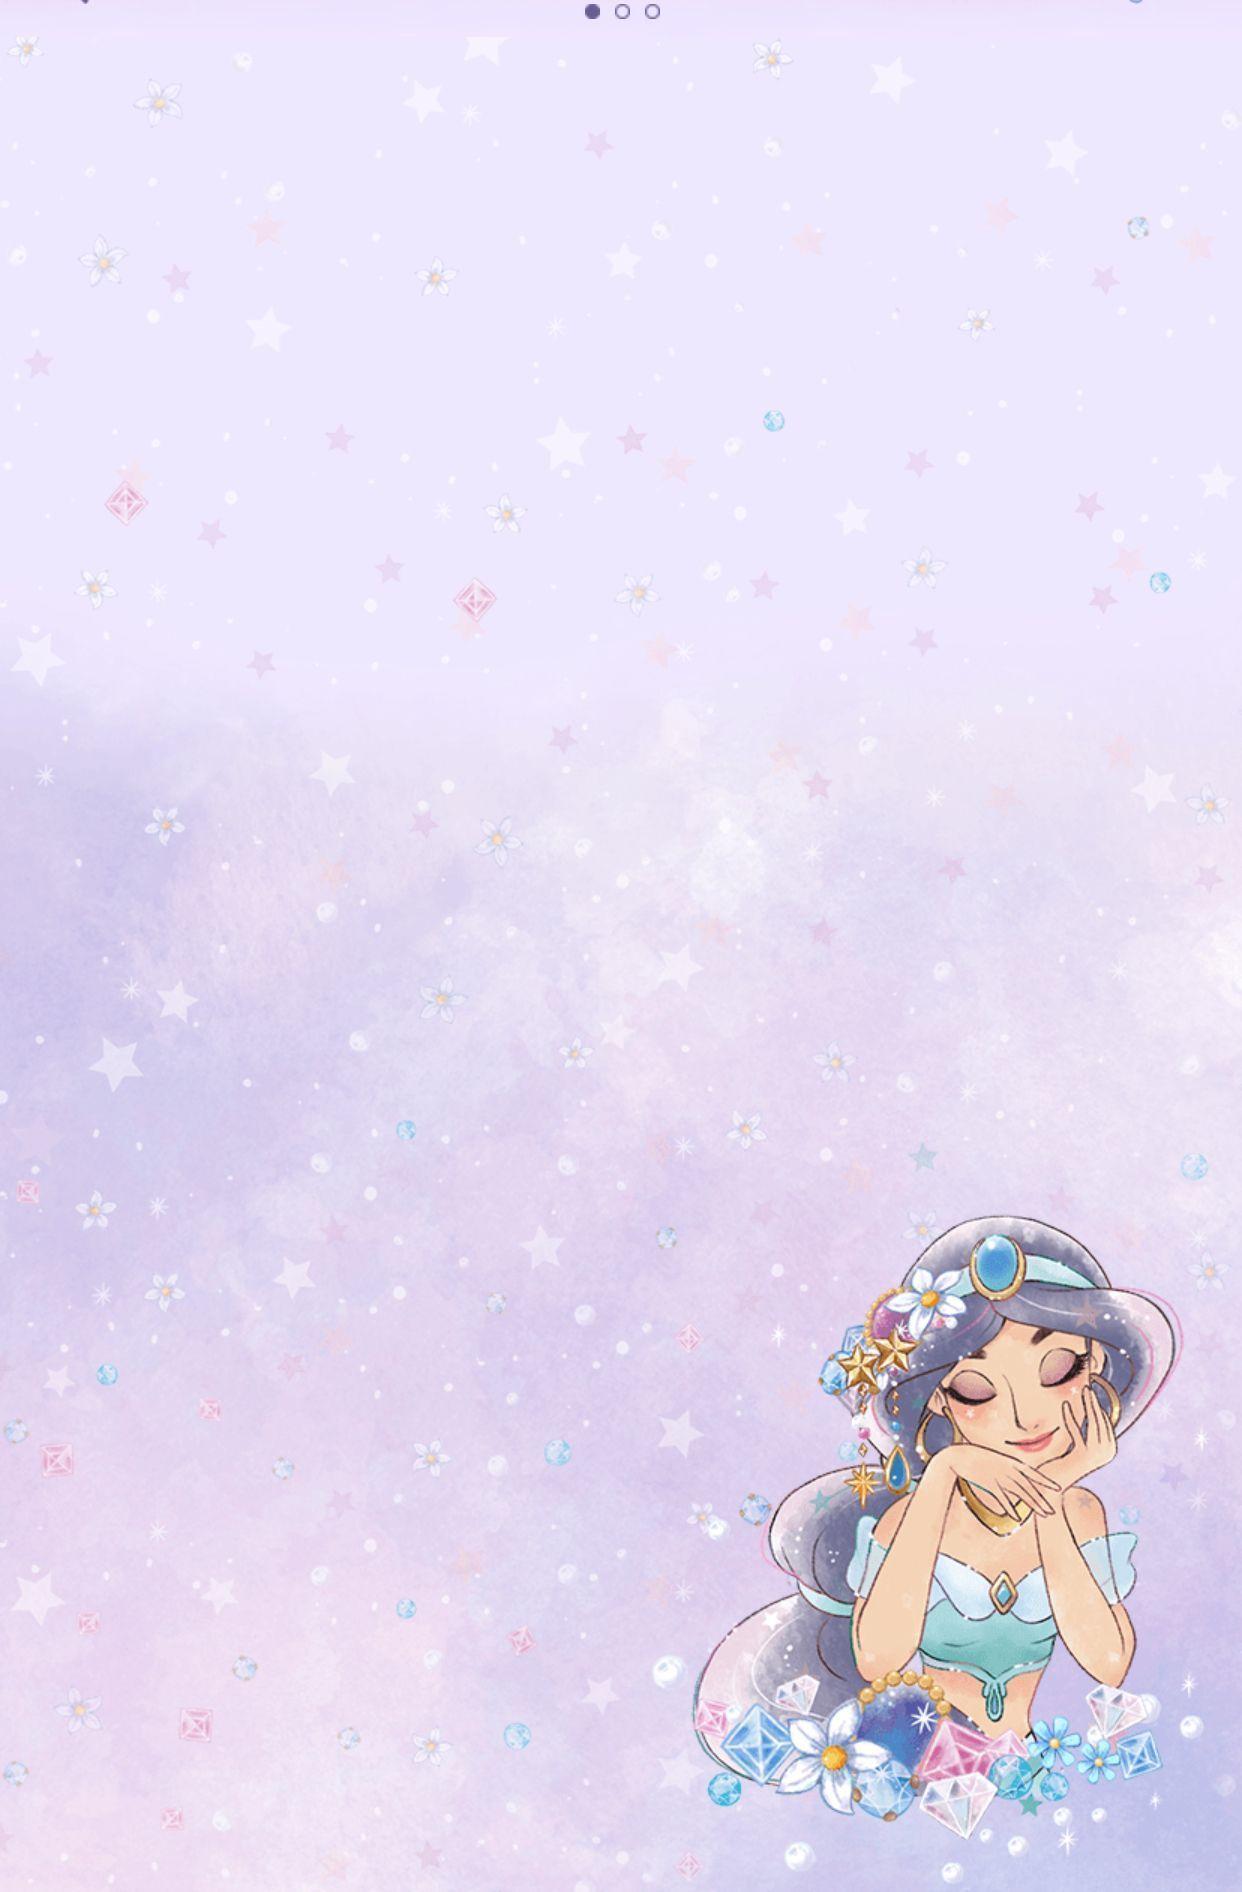 Cute Disney Princess Iphone Wallpapers Top Free Cute Disney Princess Iphone Backgrounds Wallpaperaccess